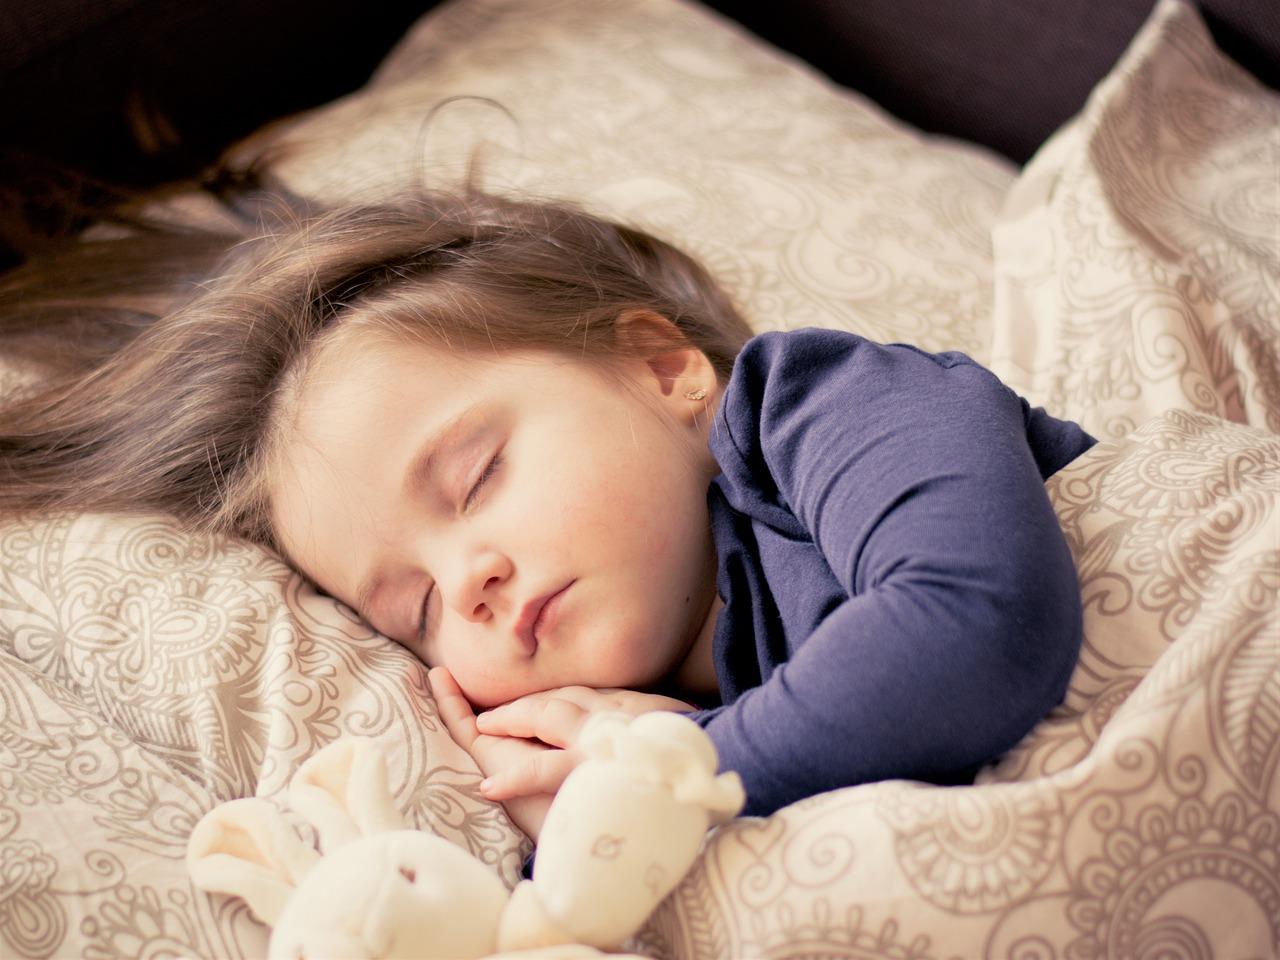 baby-1151351_1280.jpg